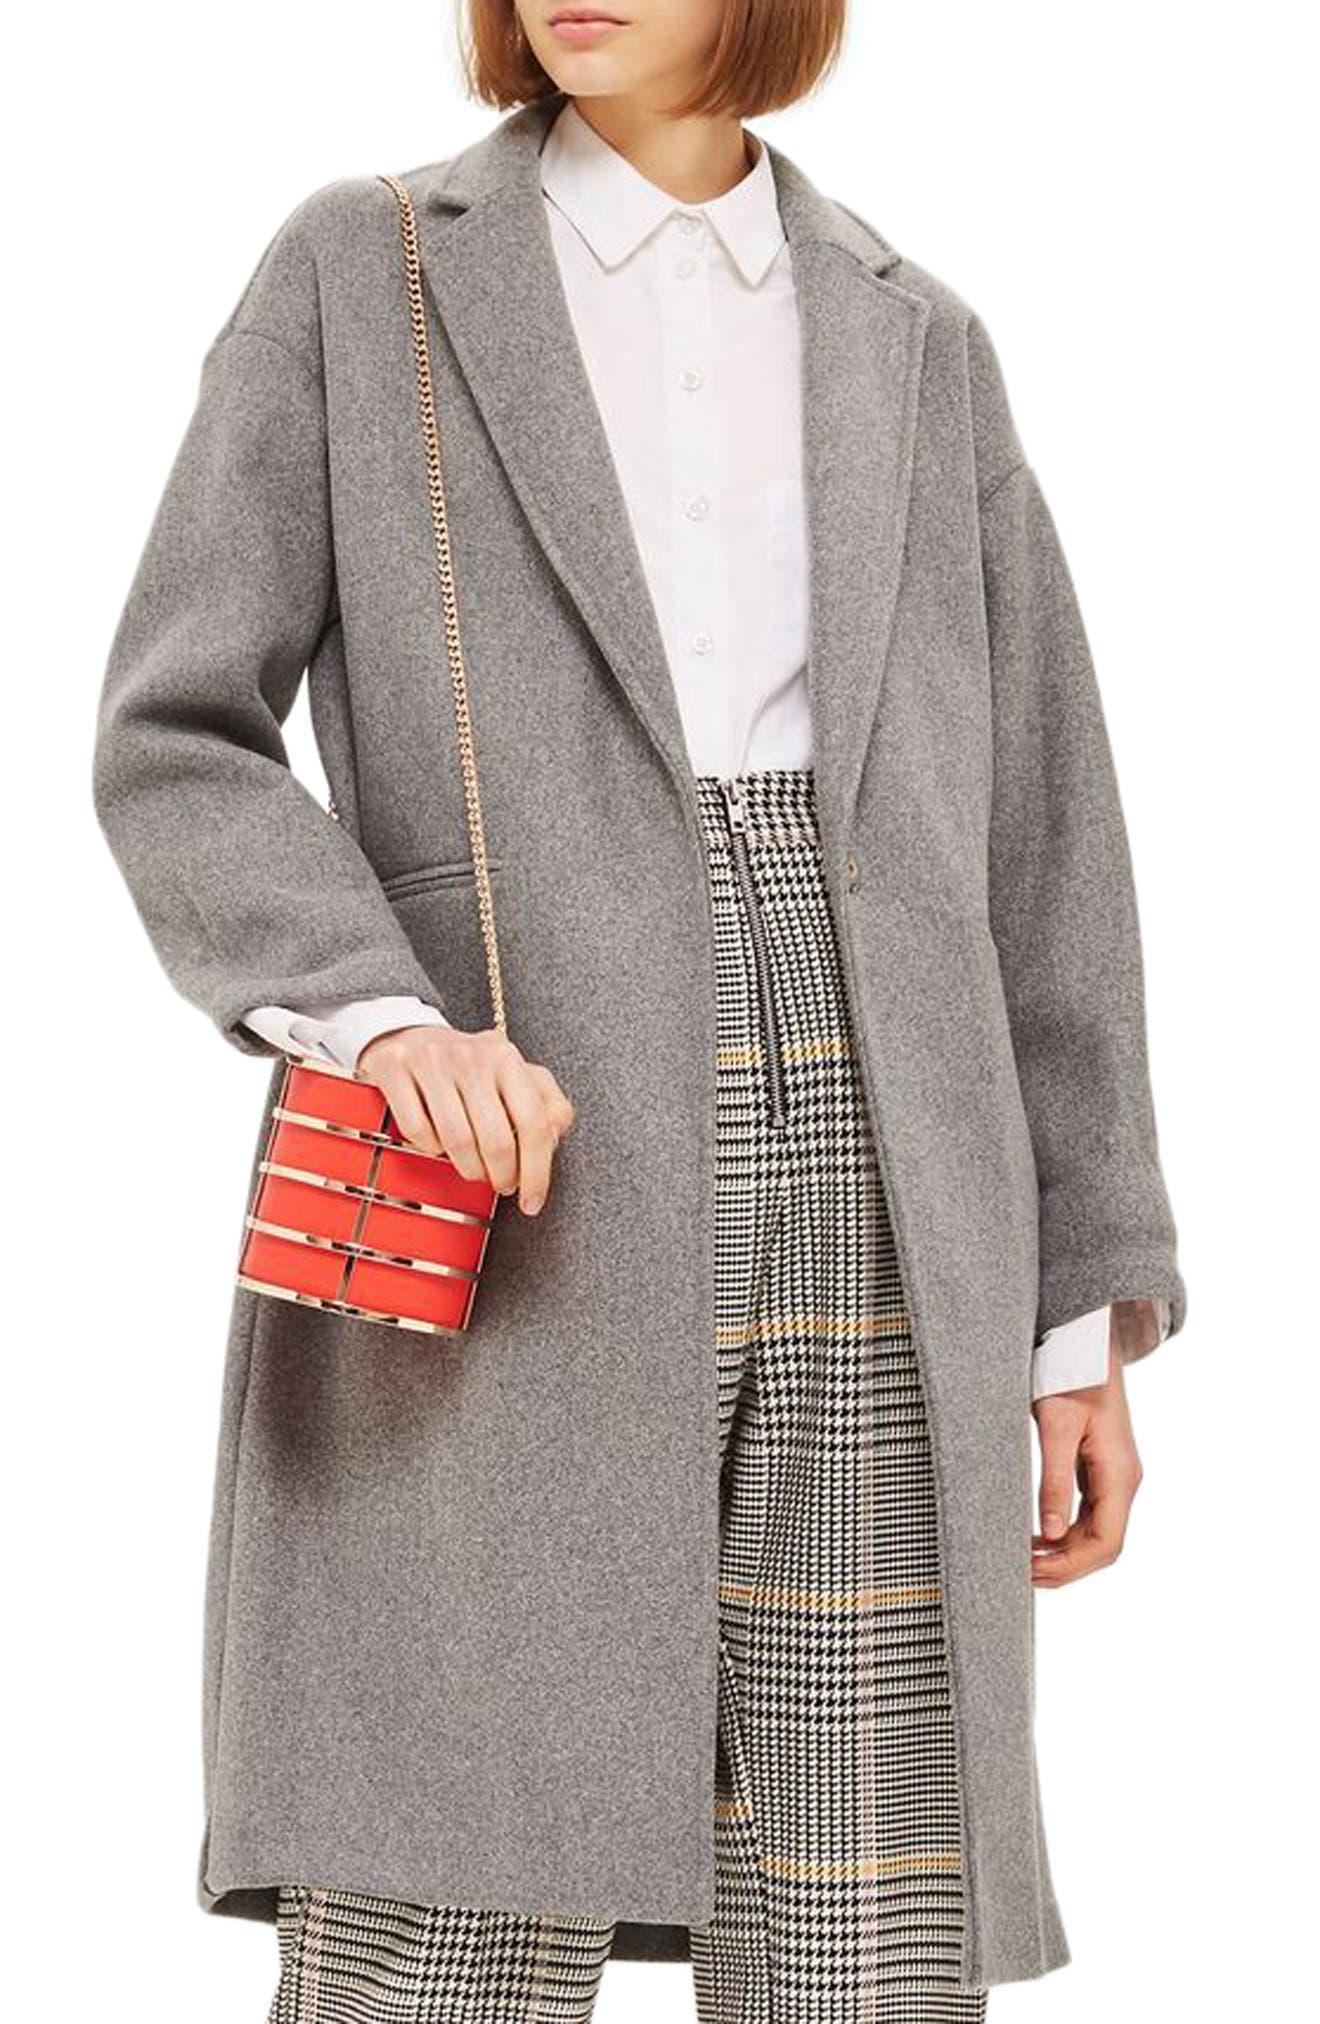 Topshop Bonded Knit Coat